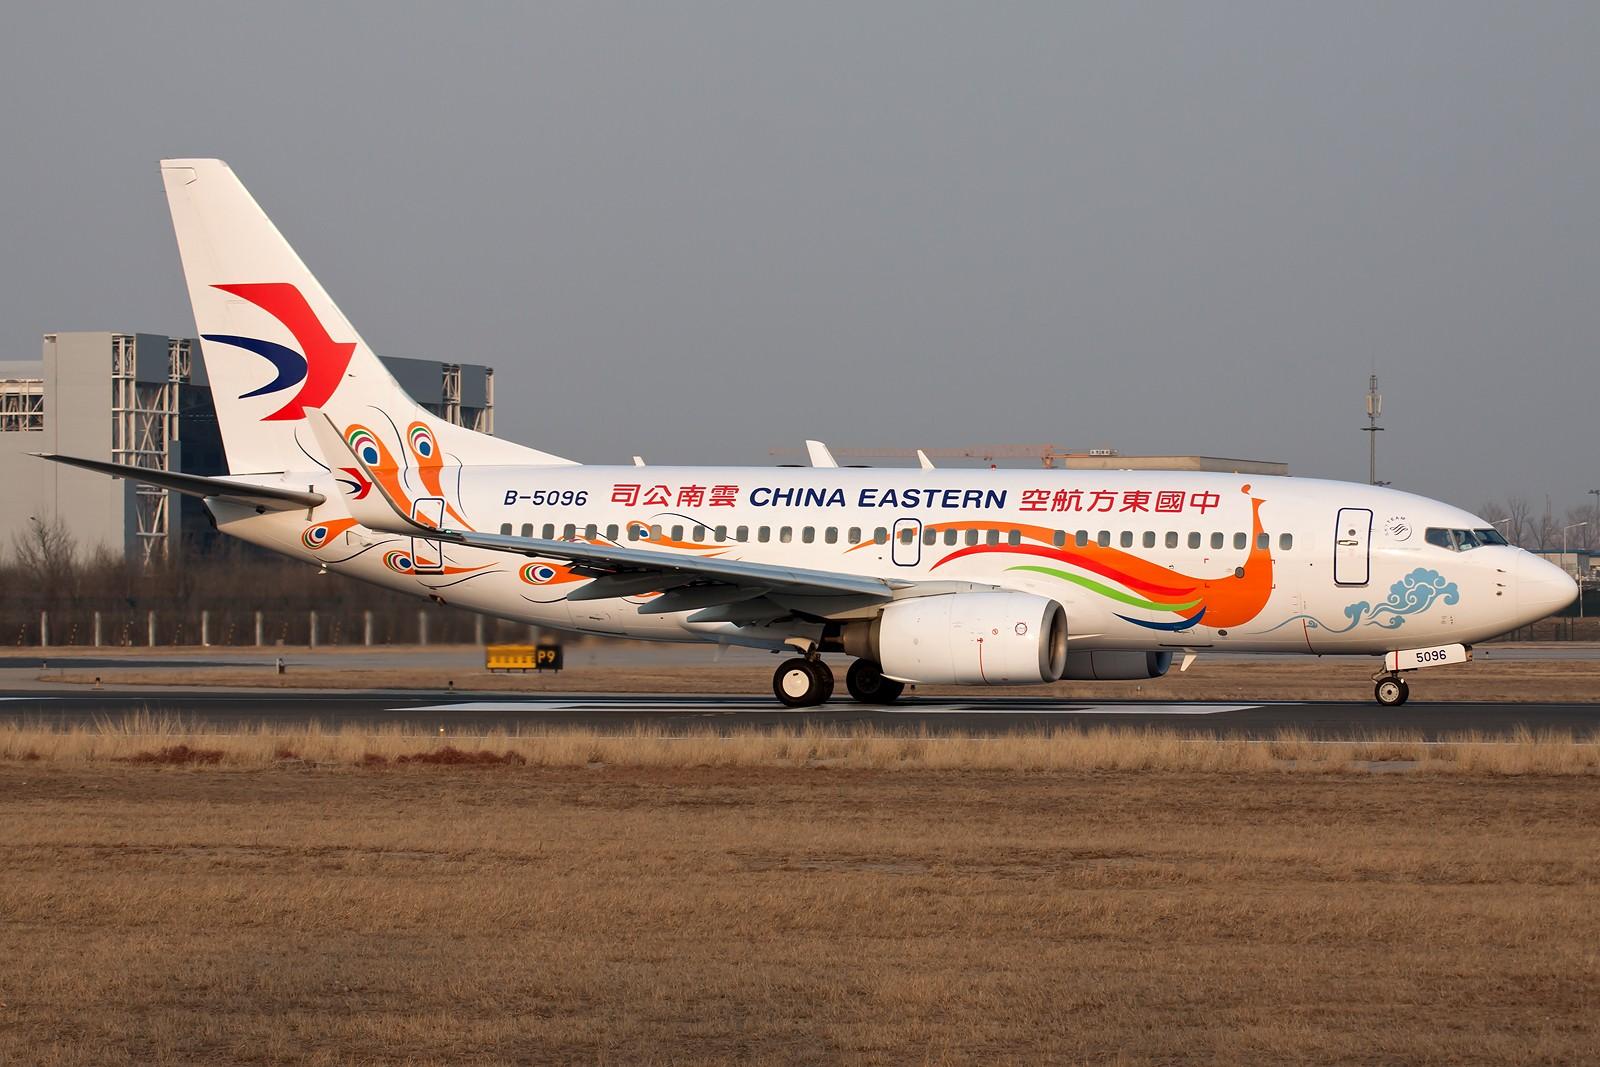 Re:[原创]中国东方航空 B-5096 B737-700WL BOEING 737-700 B-5096 中国北京首都国际机场